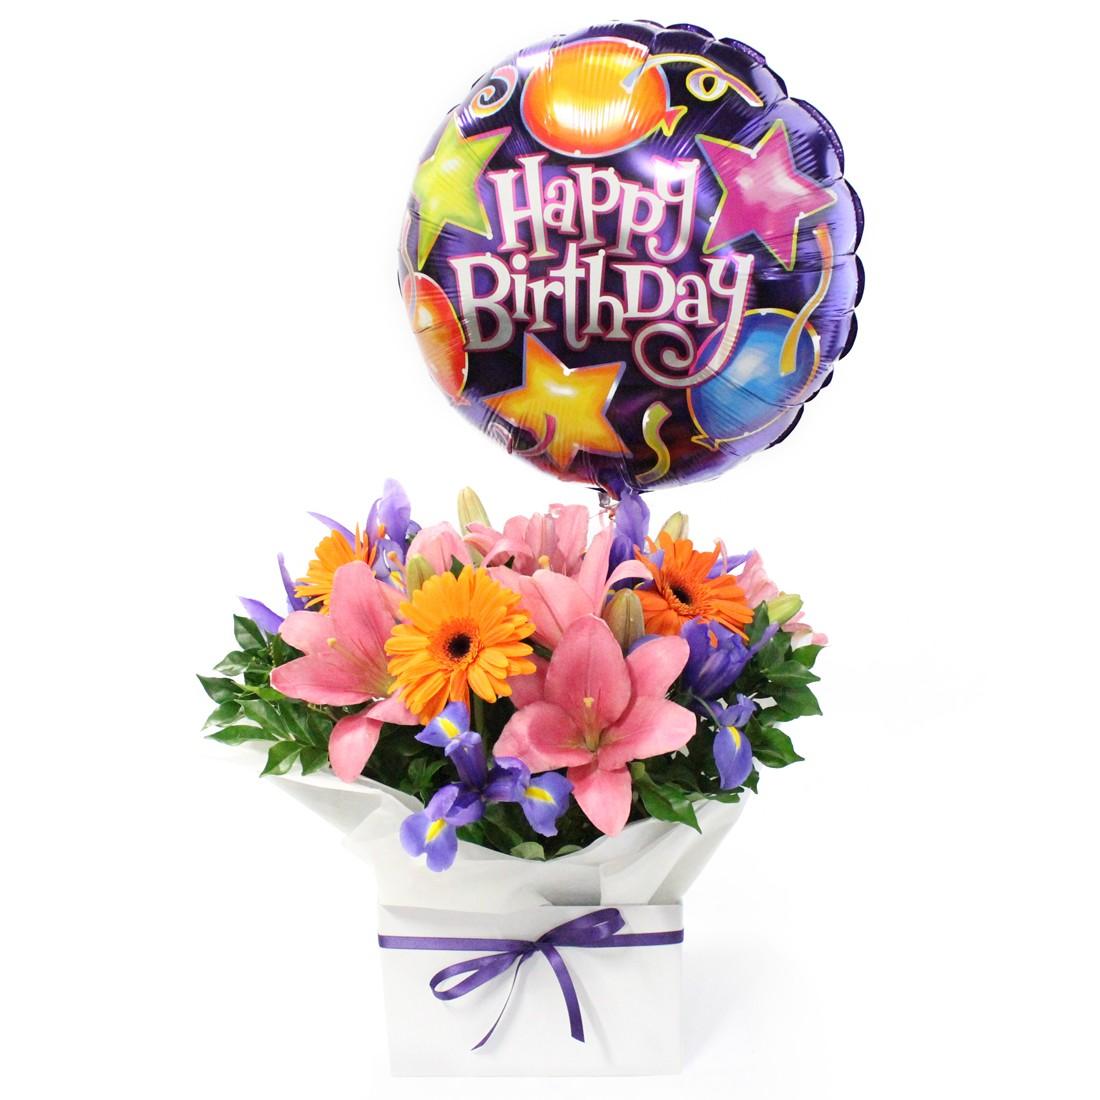 Happy birthday messages - Doğum günün kutlu olsun 7 - kuaza